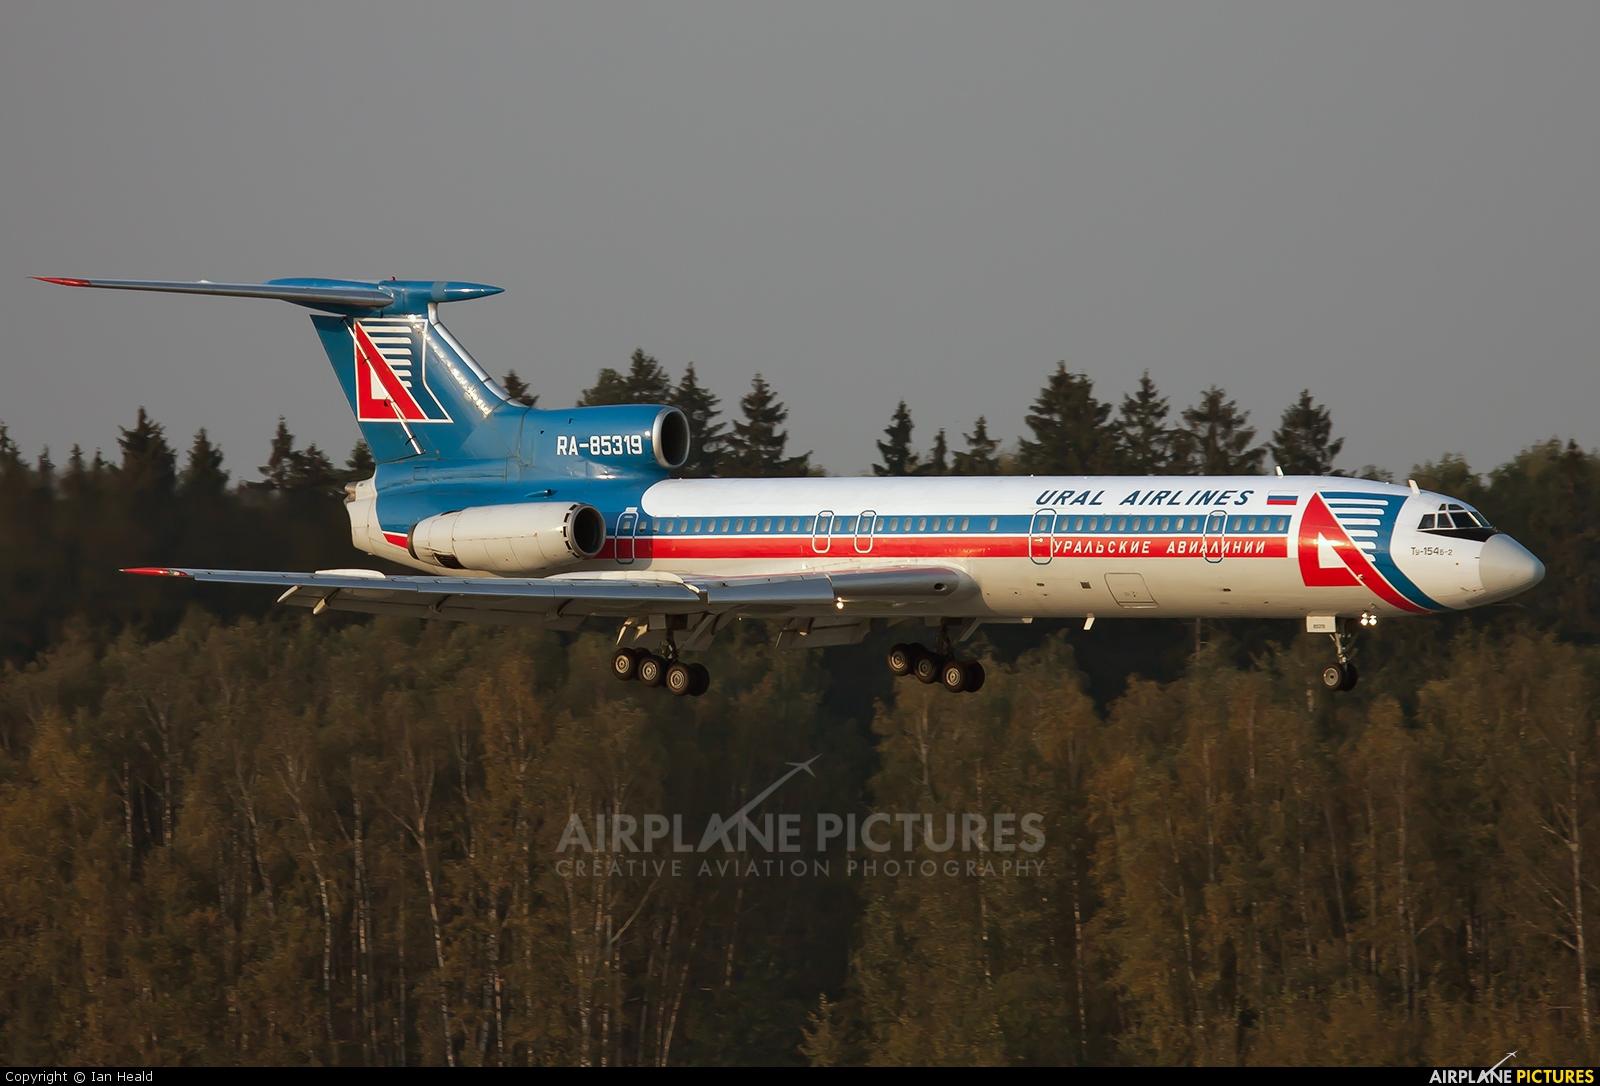 Ural Airlines RA-85319 aircraft at Moscow - Domodedovo